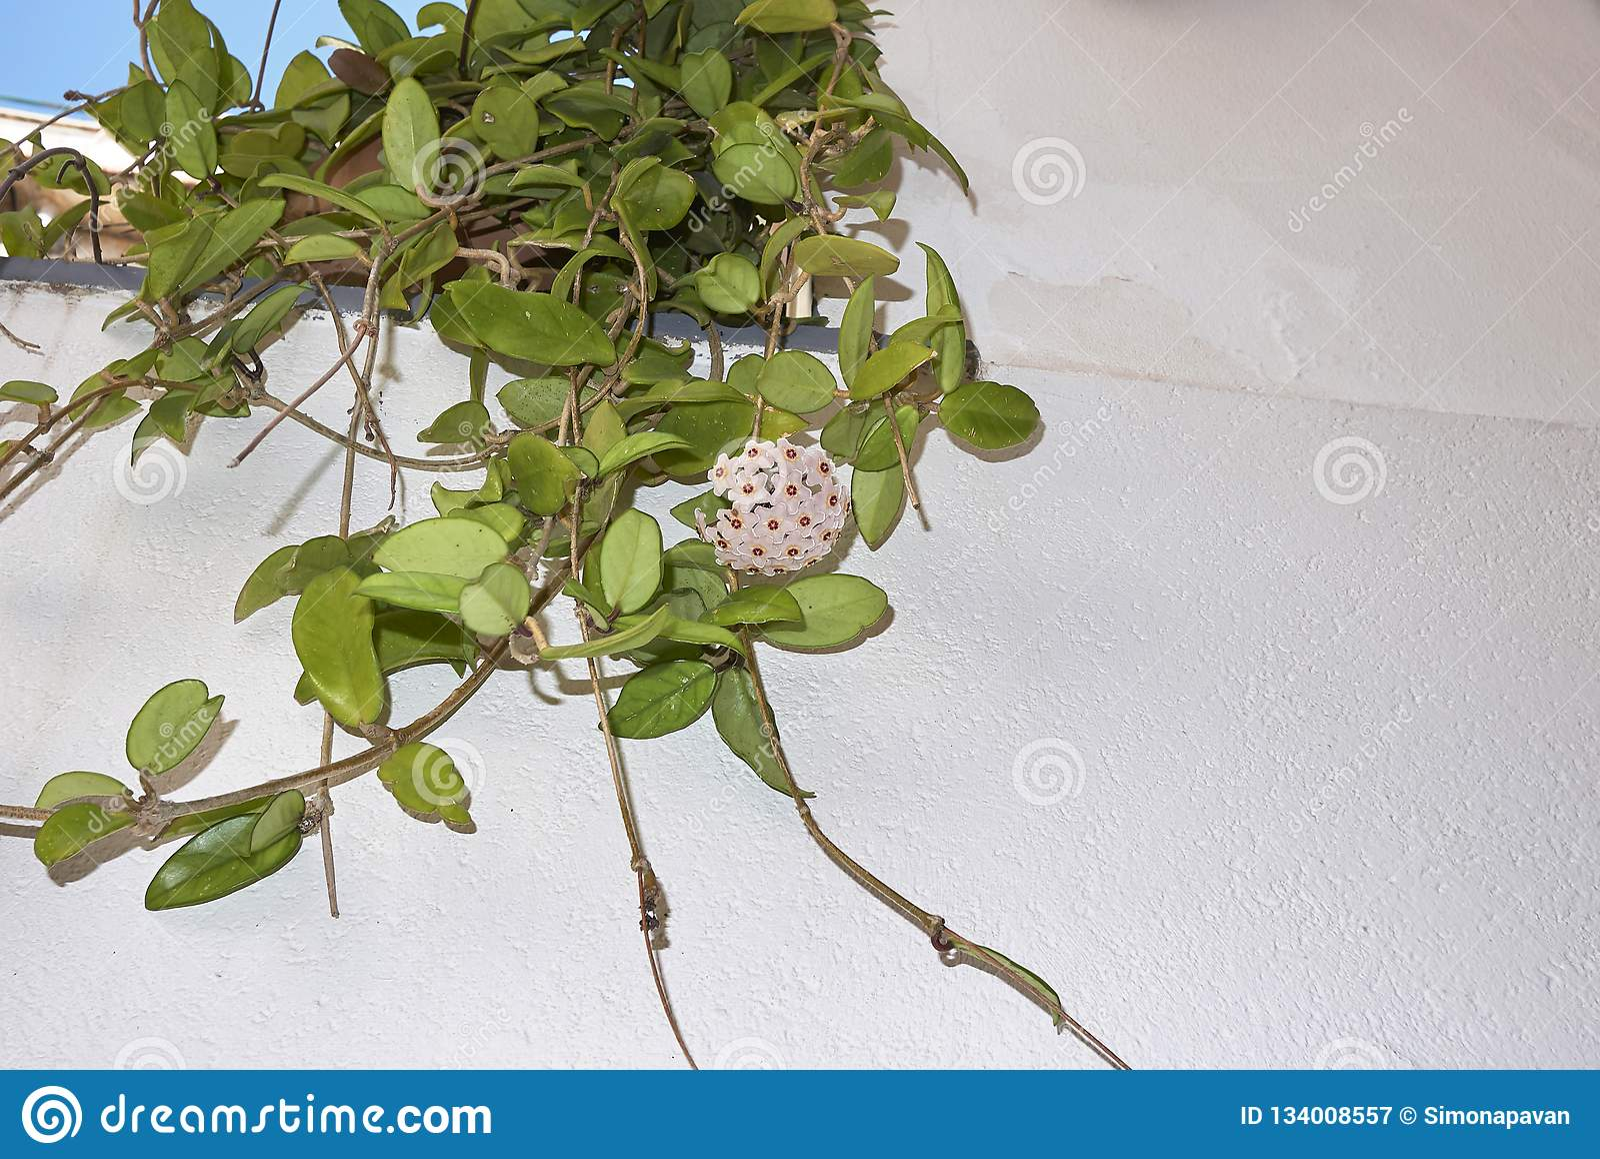 Hoya carnosa in bloom